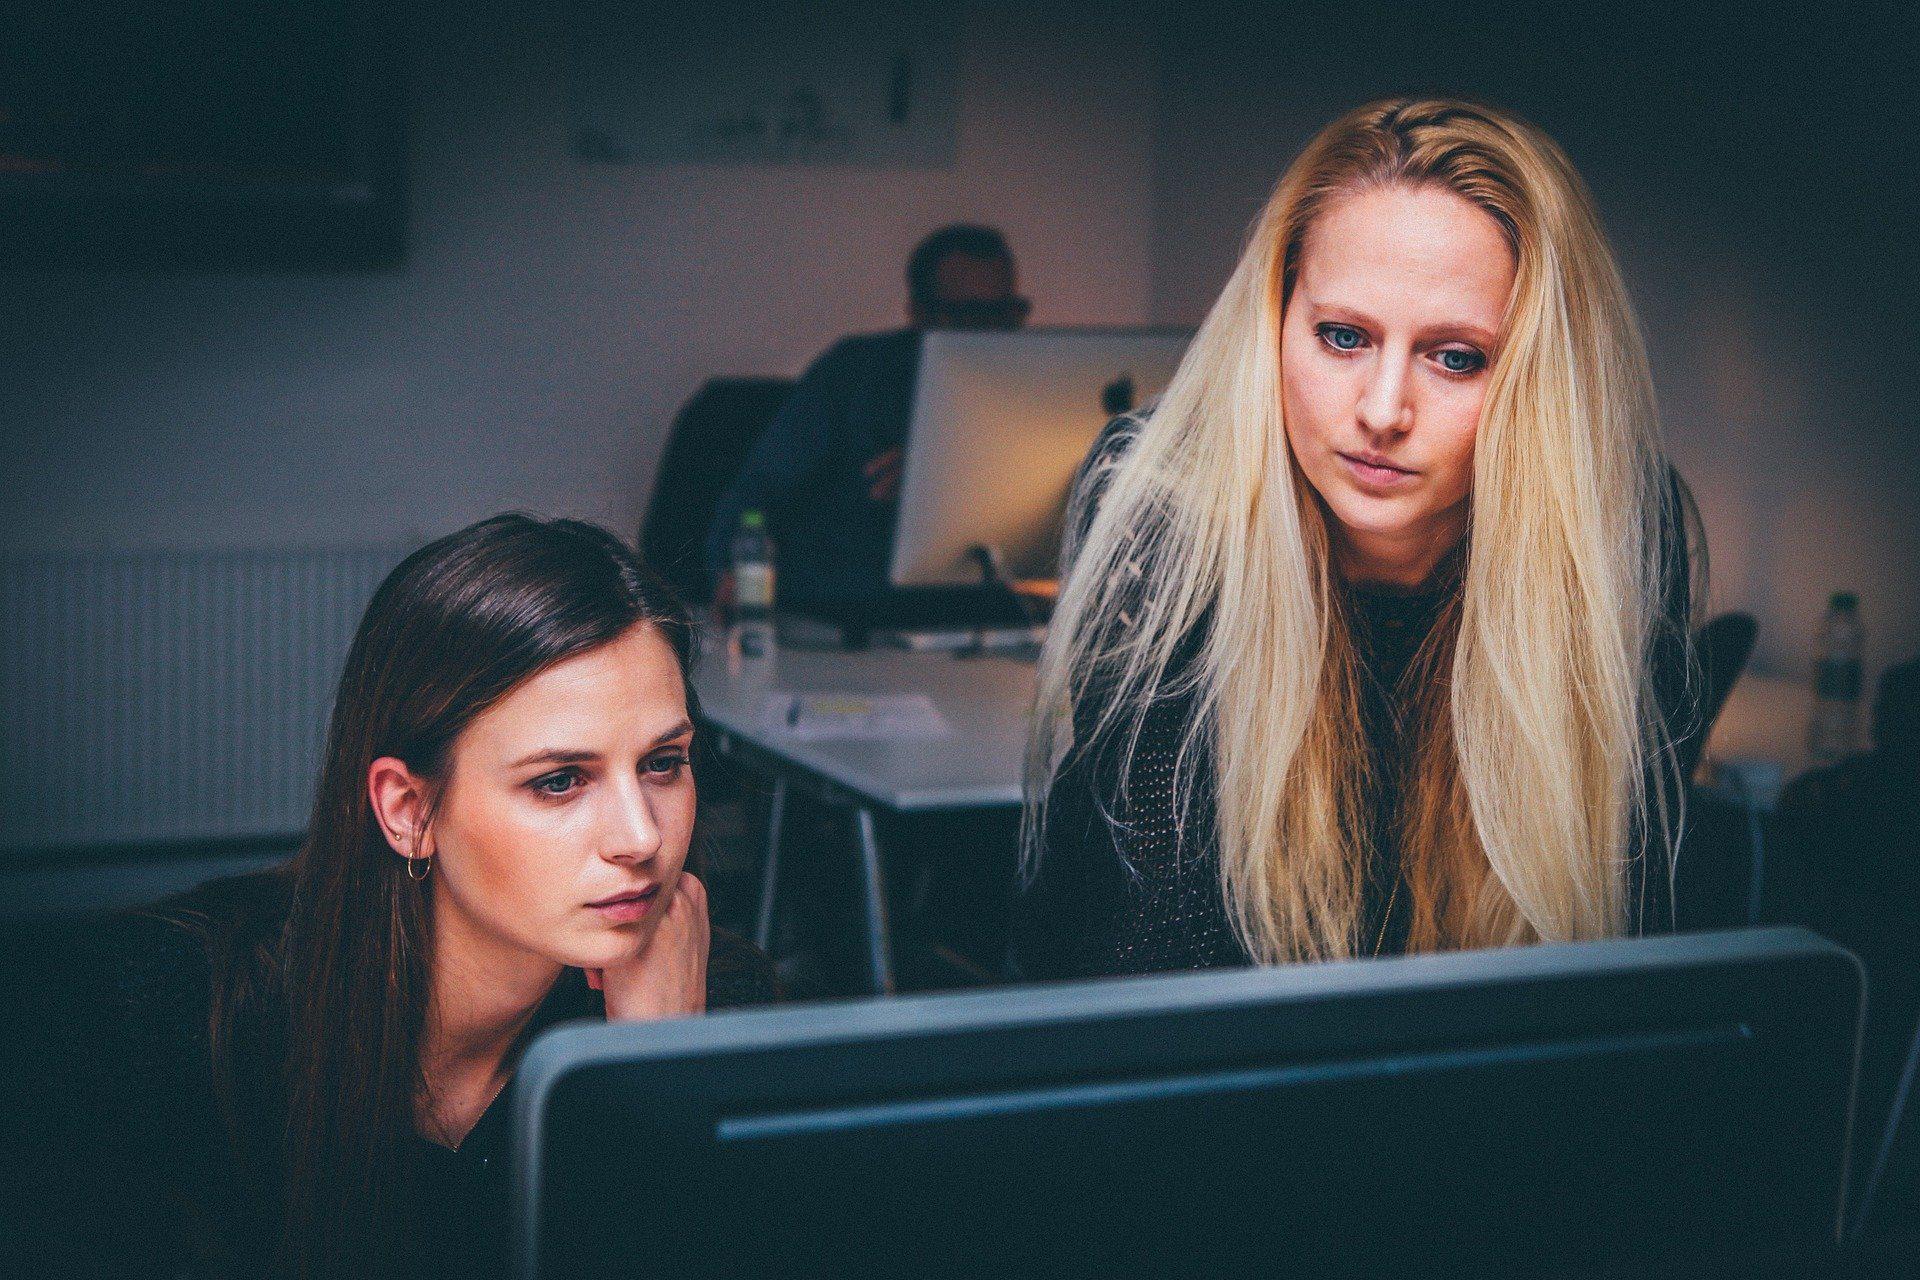 femmes au travail alternance